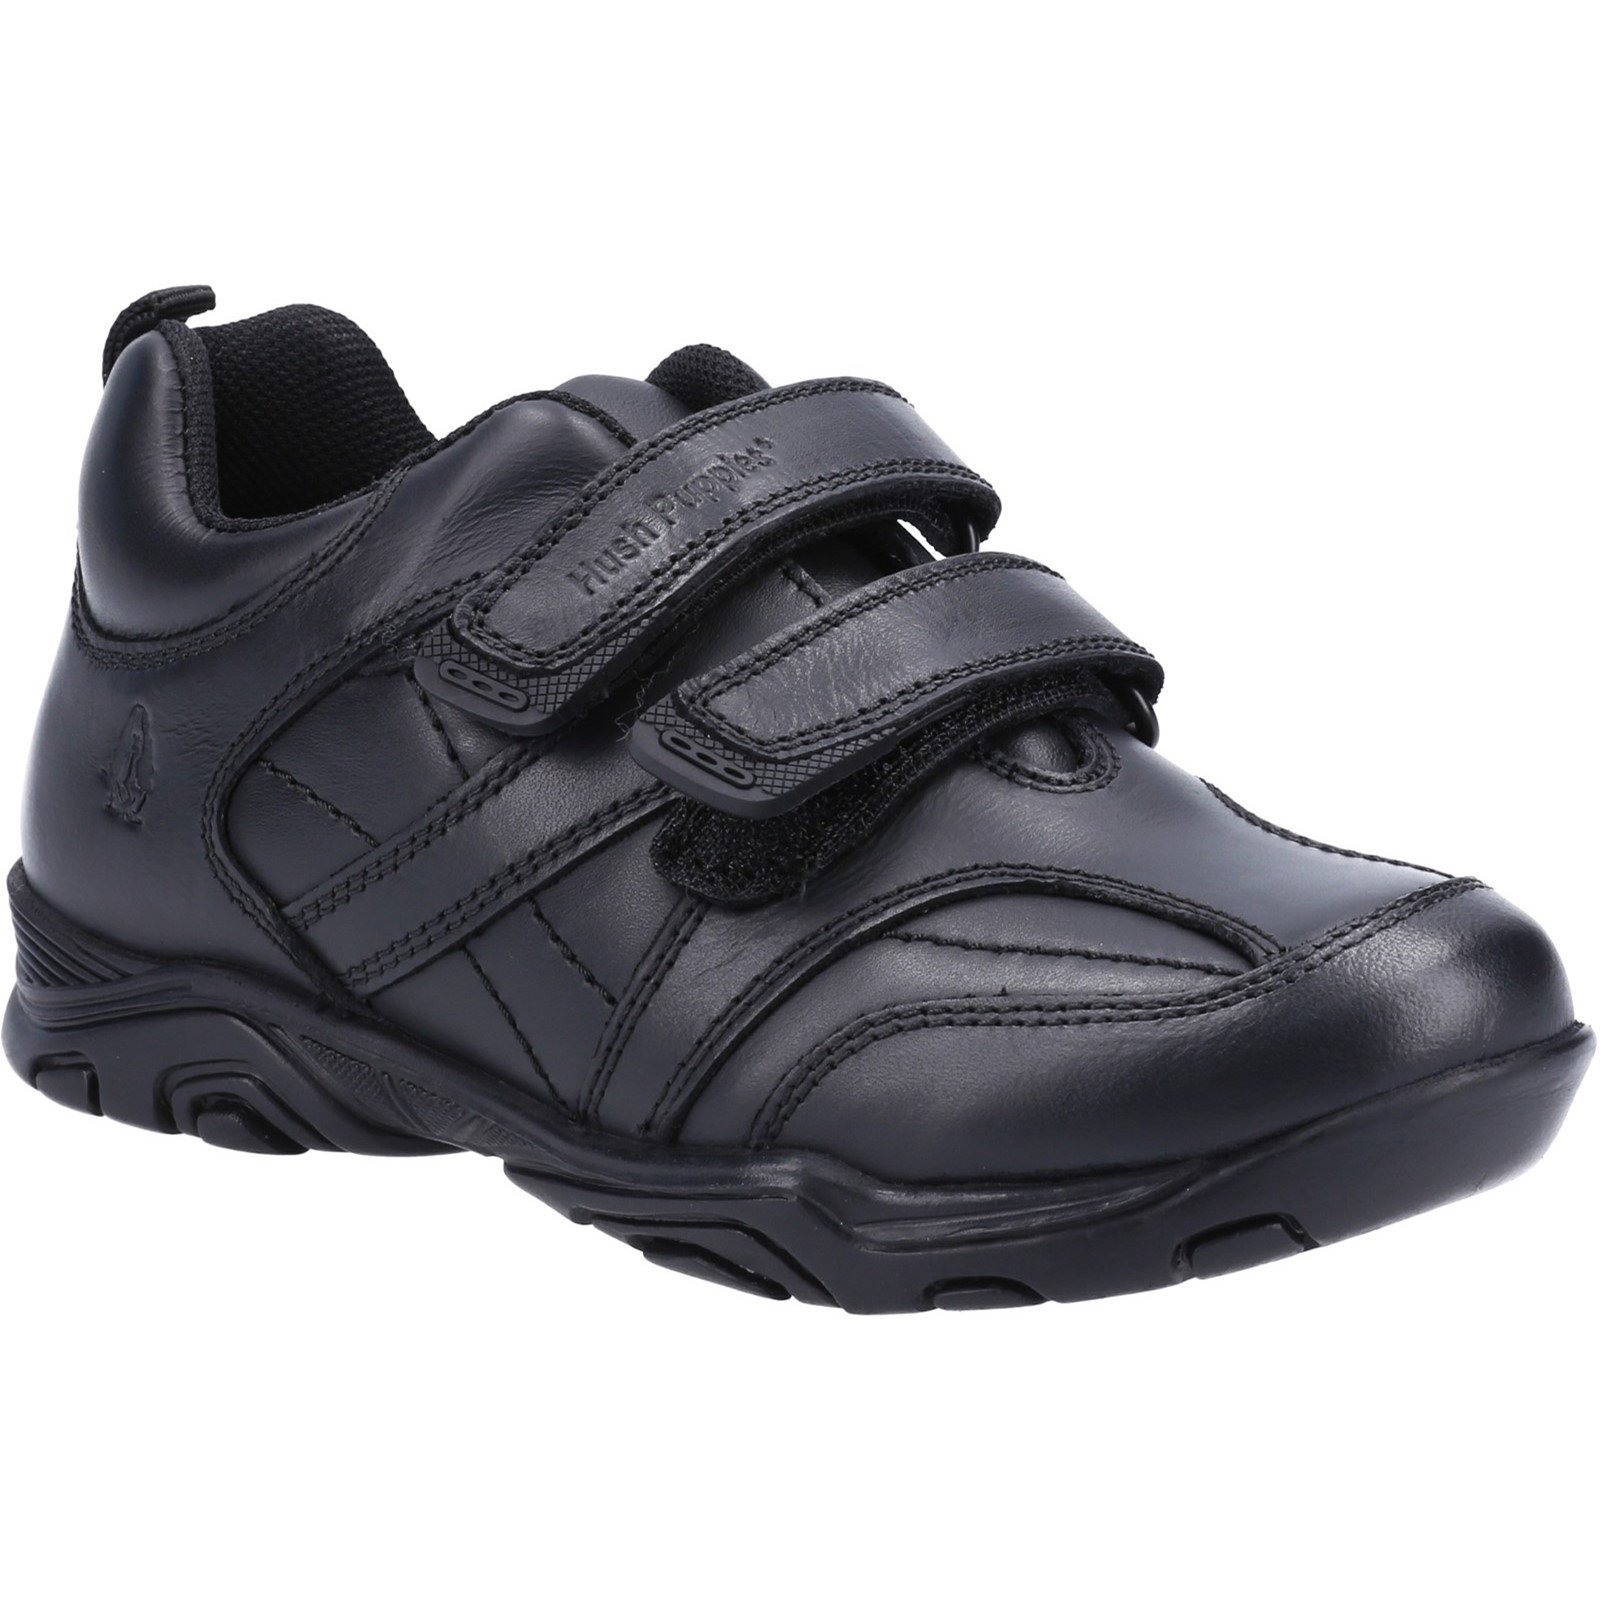 Hush Puppies Kid's Levi Infant School Shoe Black 32629 - Black 10